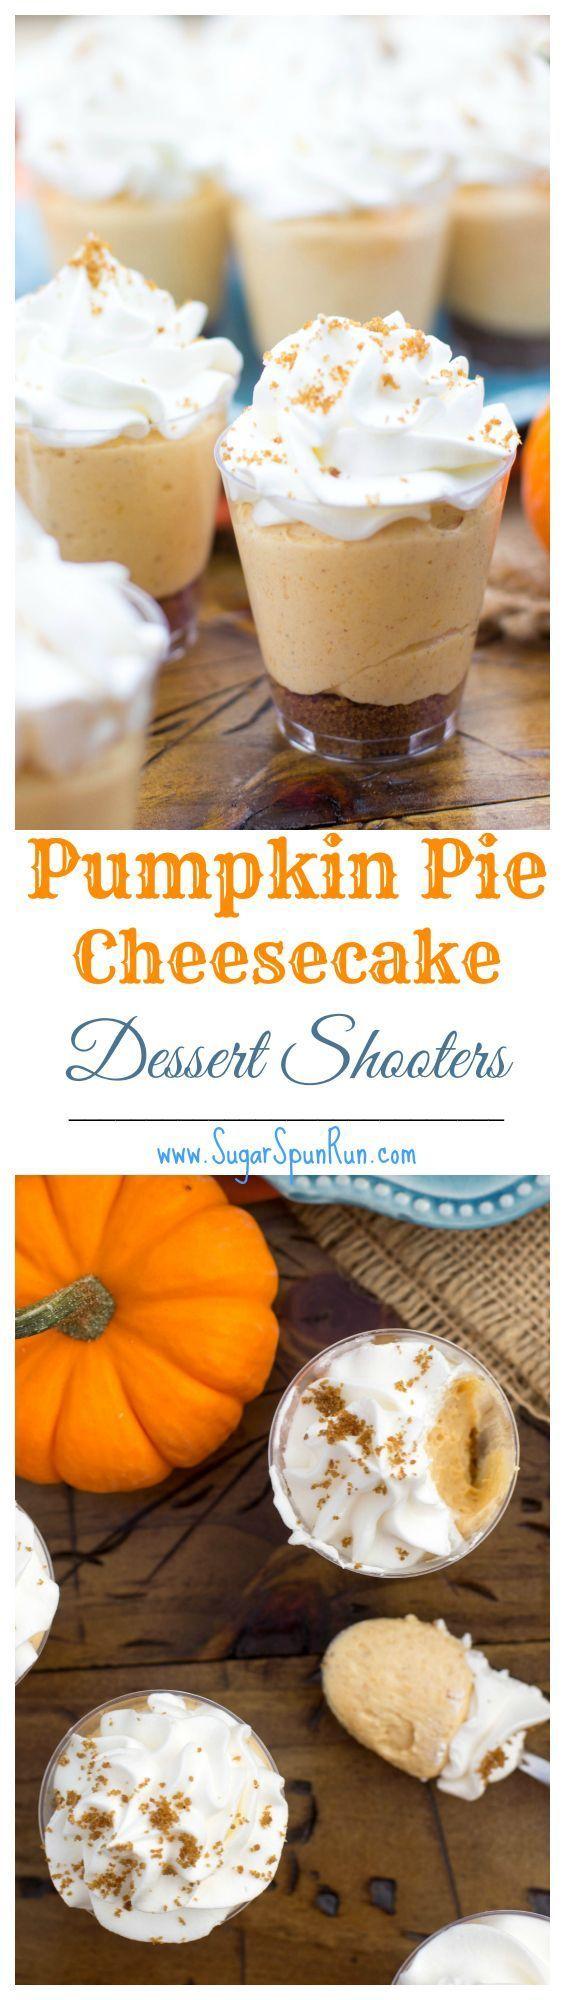 No bake pumpkin pie cheesecake dessert shooters, a great, unique Thanksgiving treat SugarSpunRun